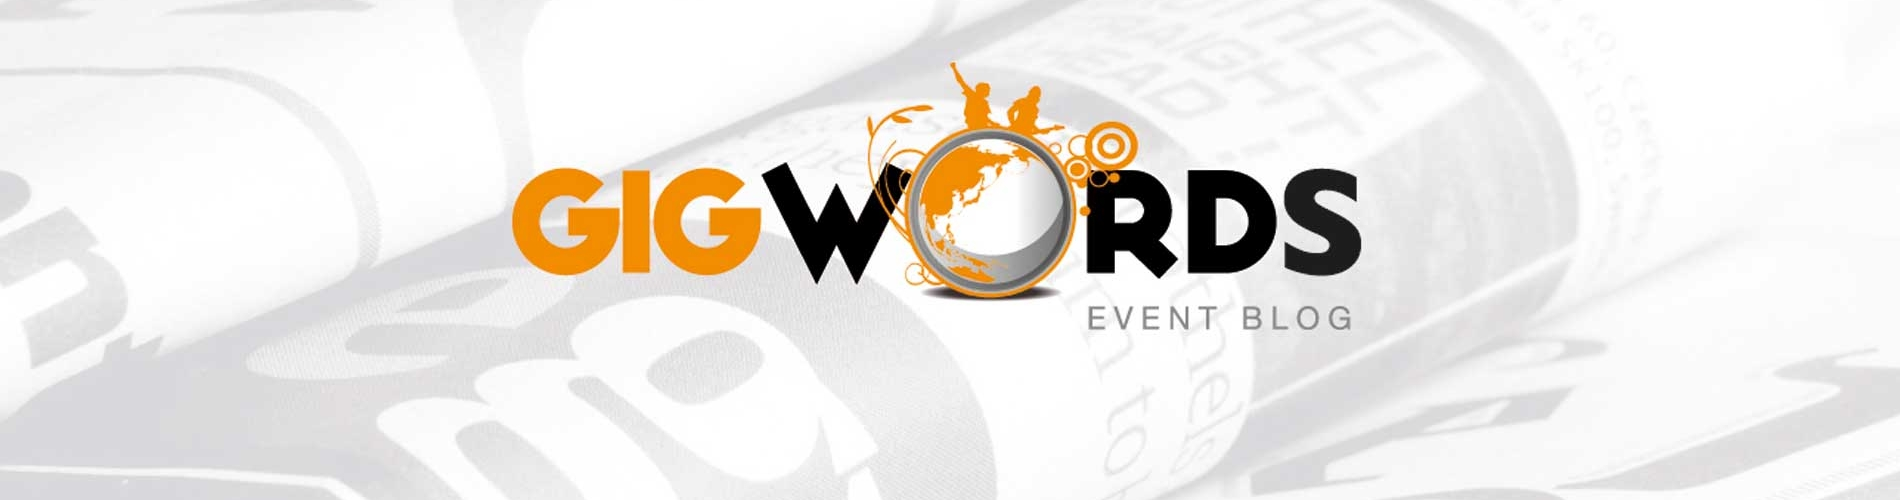 GigWords